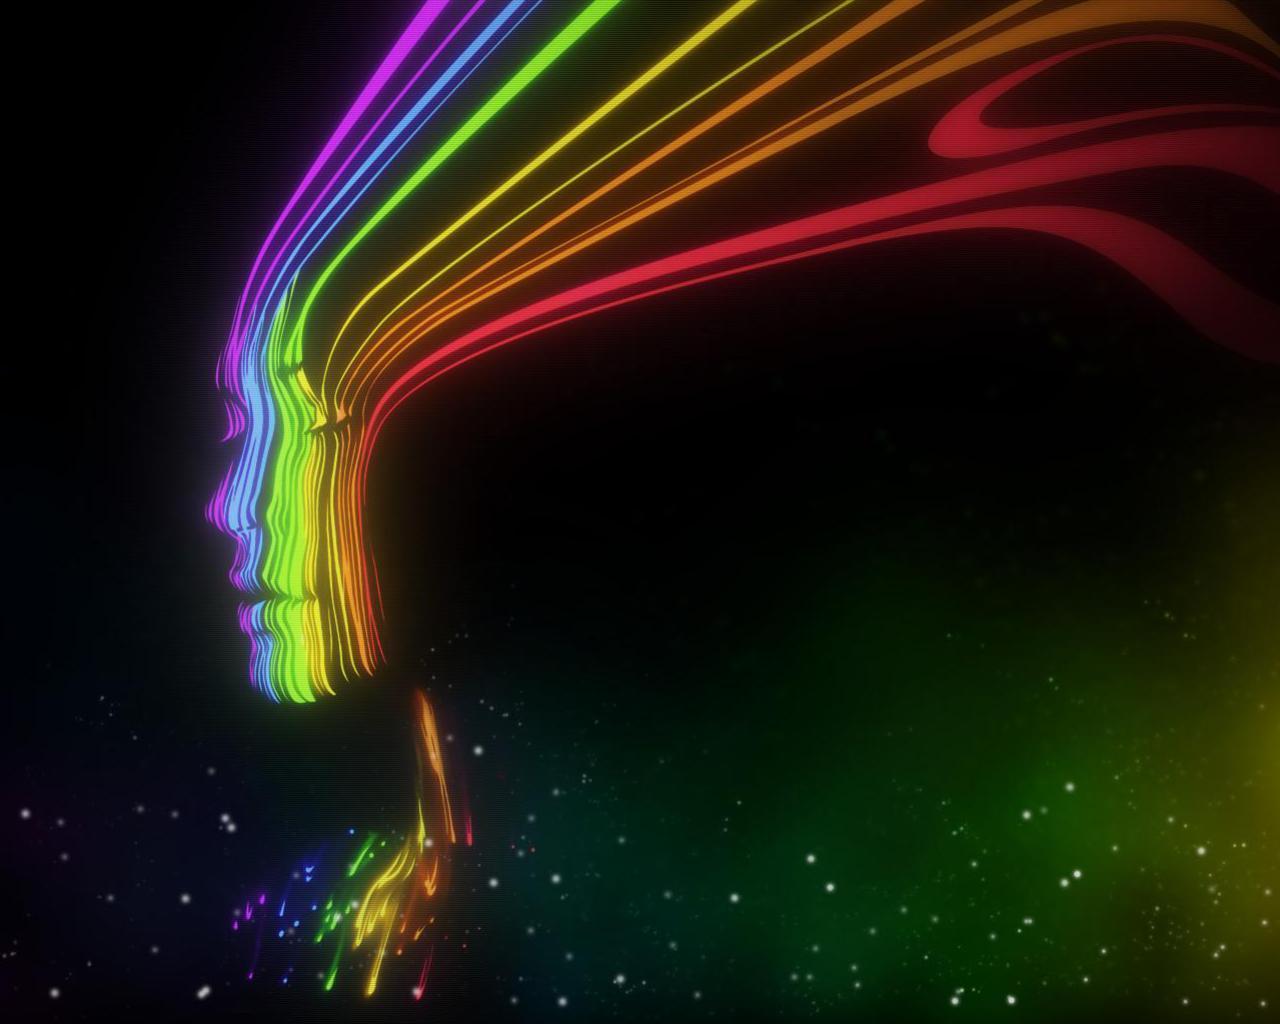 http://1.bp.blogspot.com/-Zf9Fs2shJkY/TY9ftUNGwUI/AAAAAAAADlI/0W9PeTbxfj4/s1600/abstract_curcubeu_rogvaiv.jpg